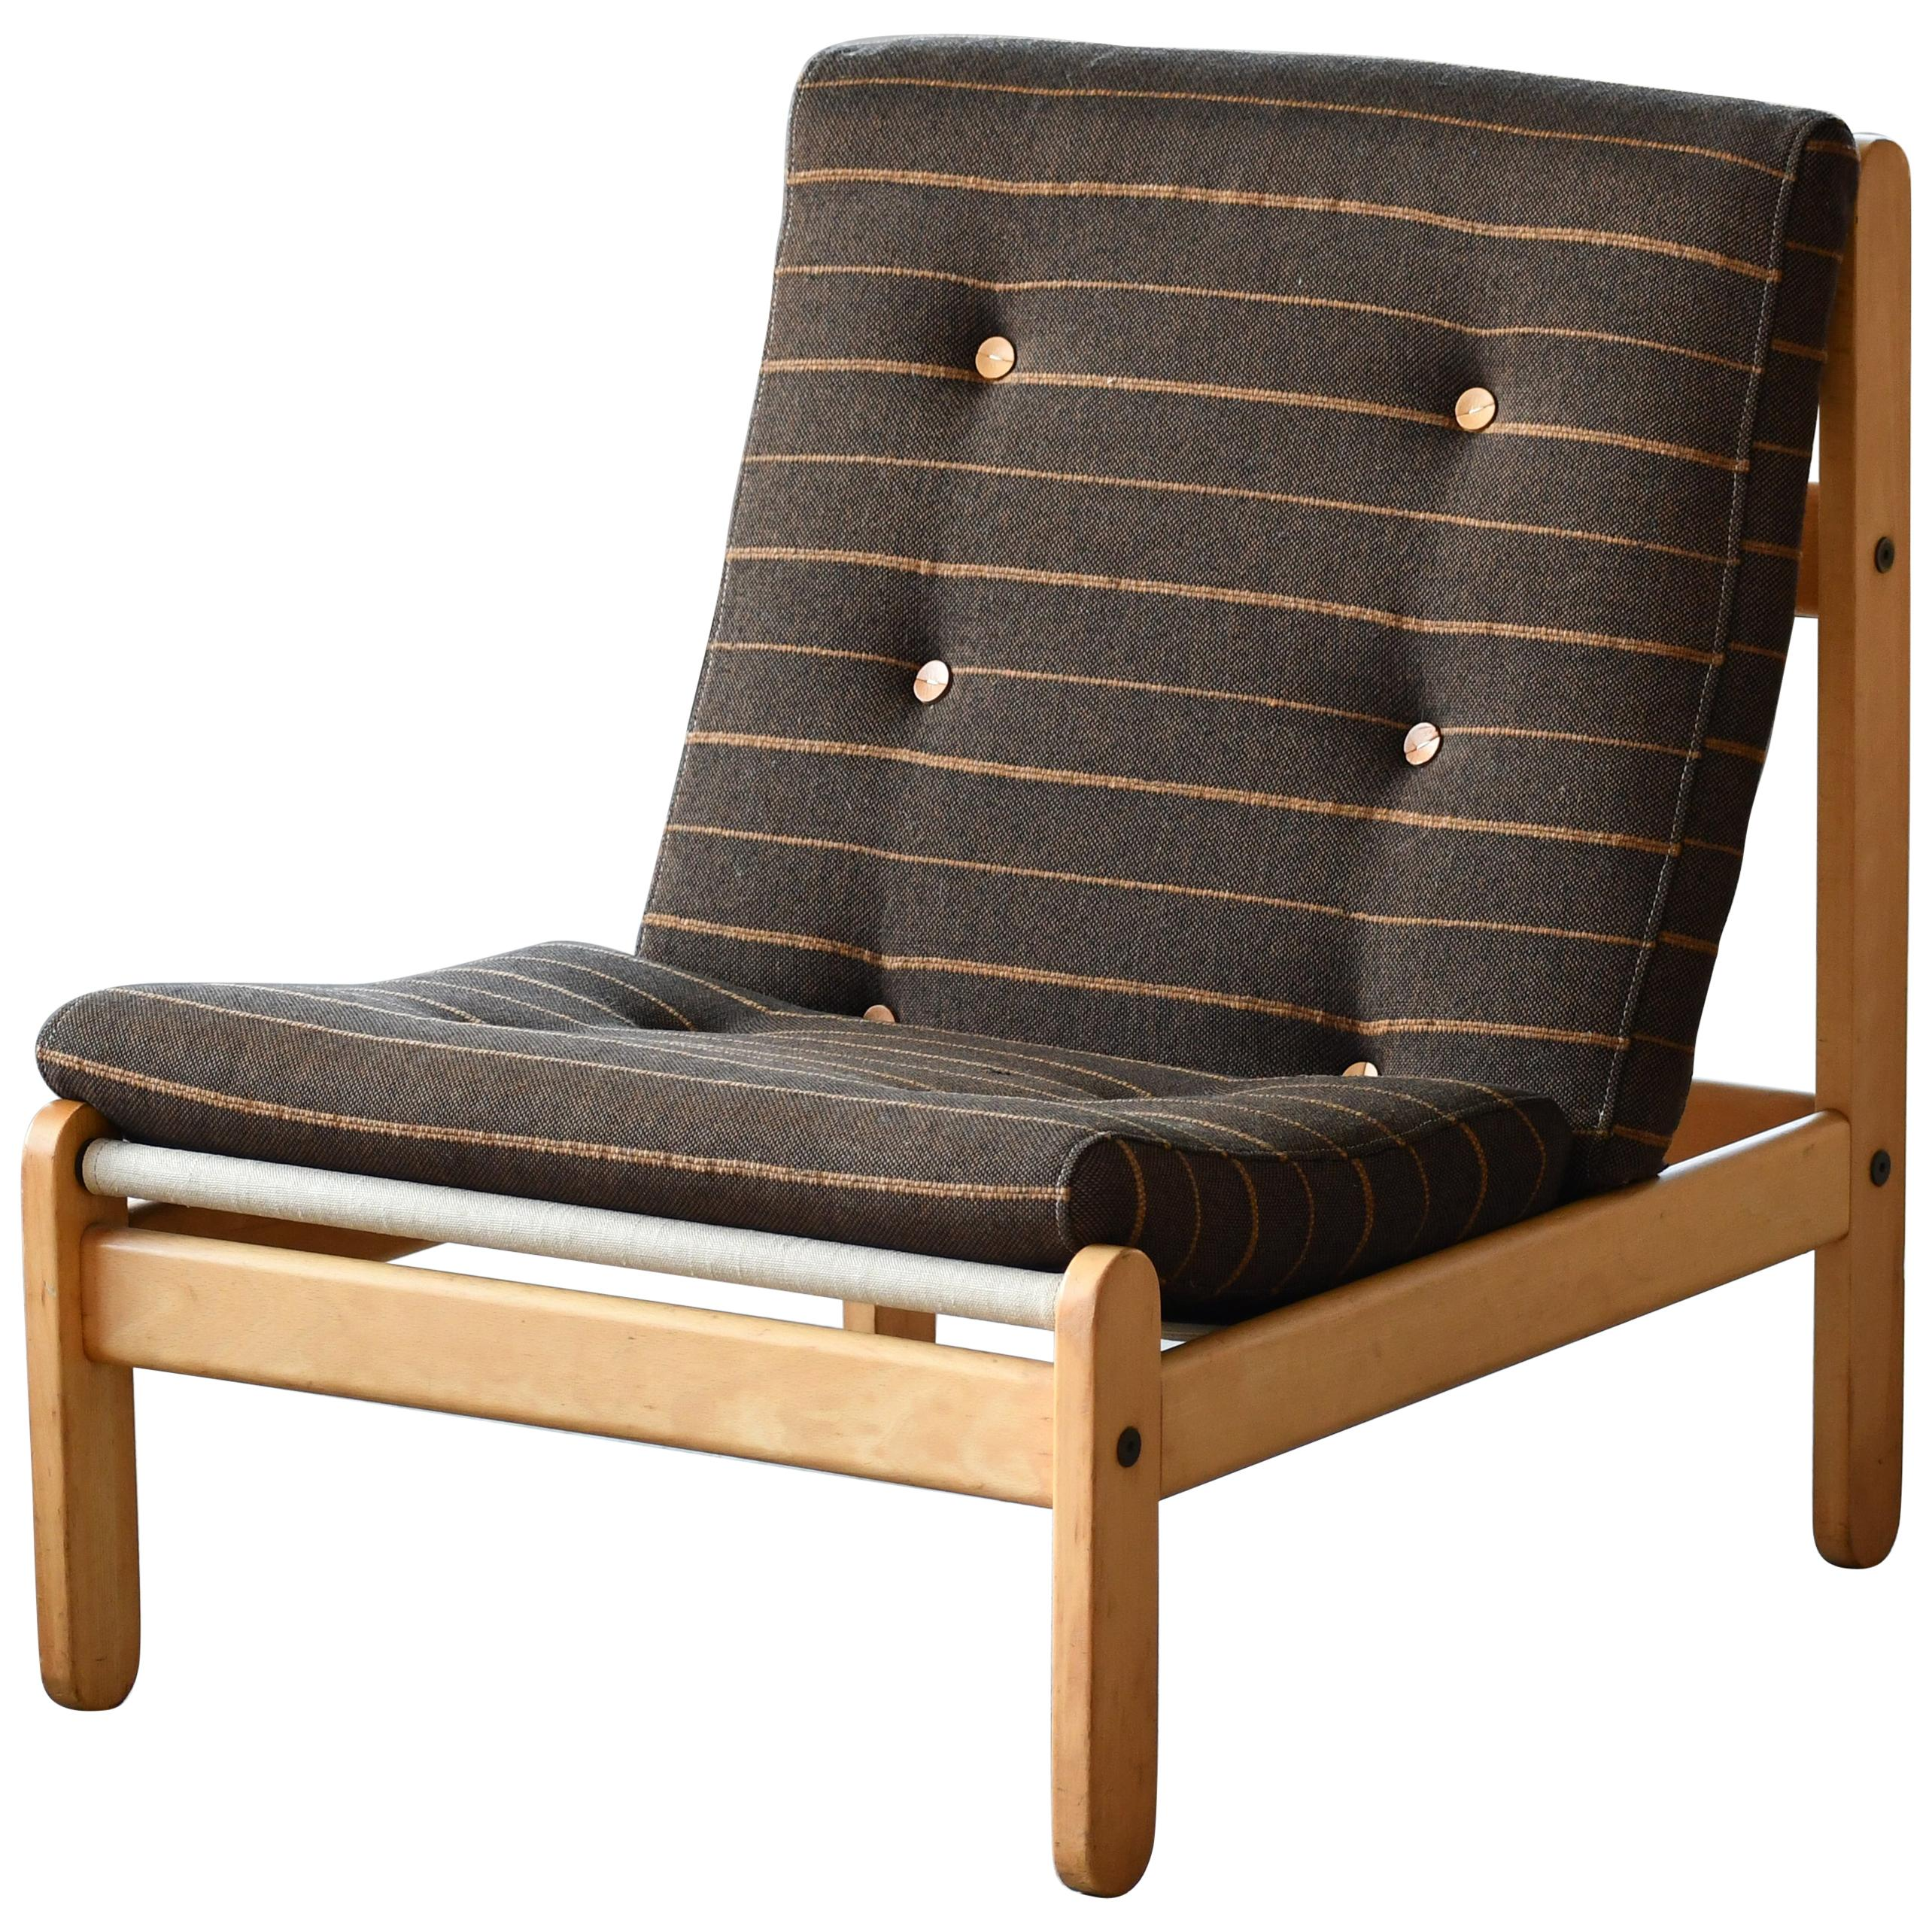 Danish 1960s Rag Chair Variant in Oak by Bernt Petersen for Chiang